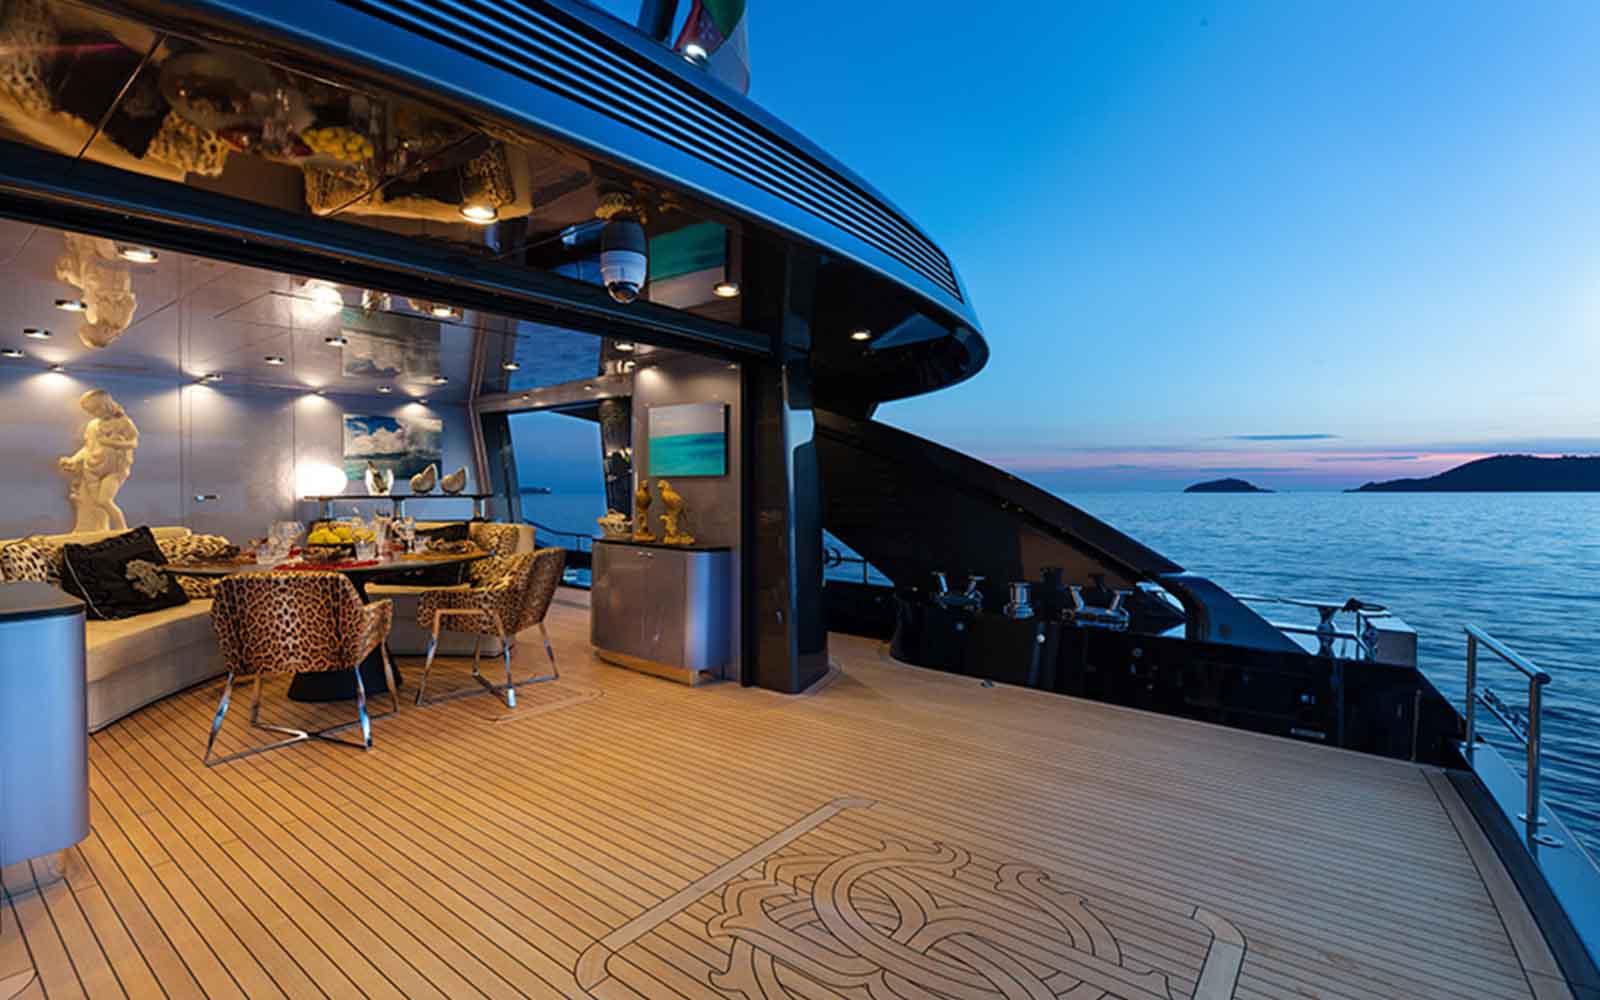 iate freedom ccn roberto cavalli - boat shopping 13